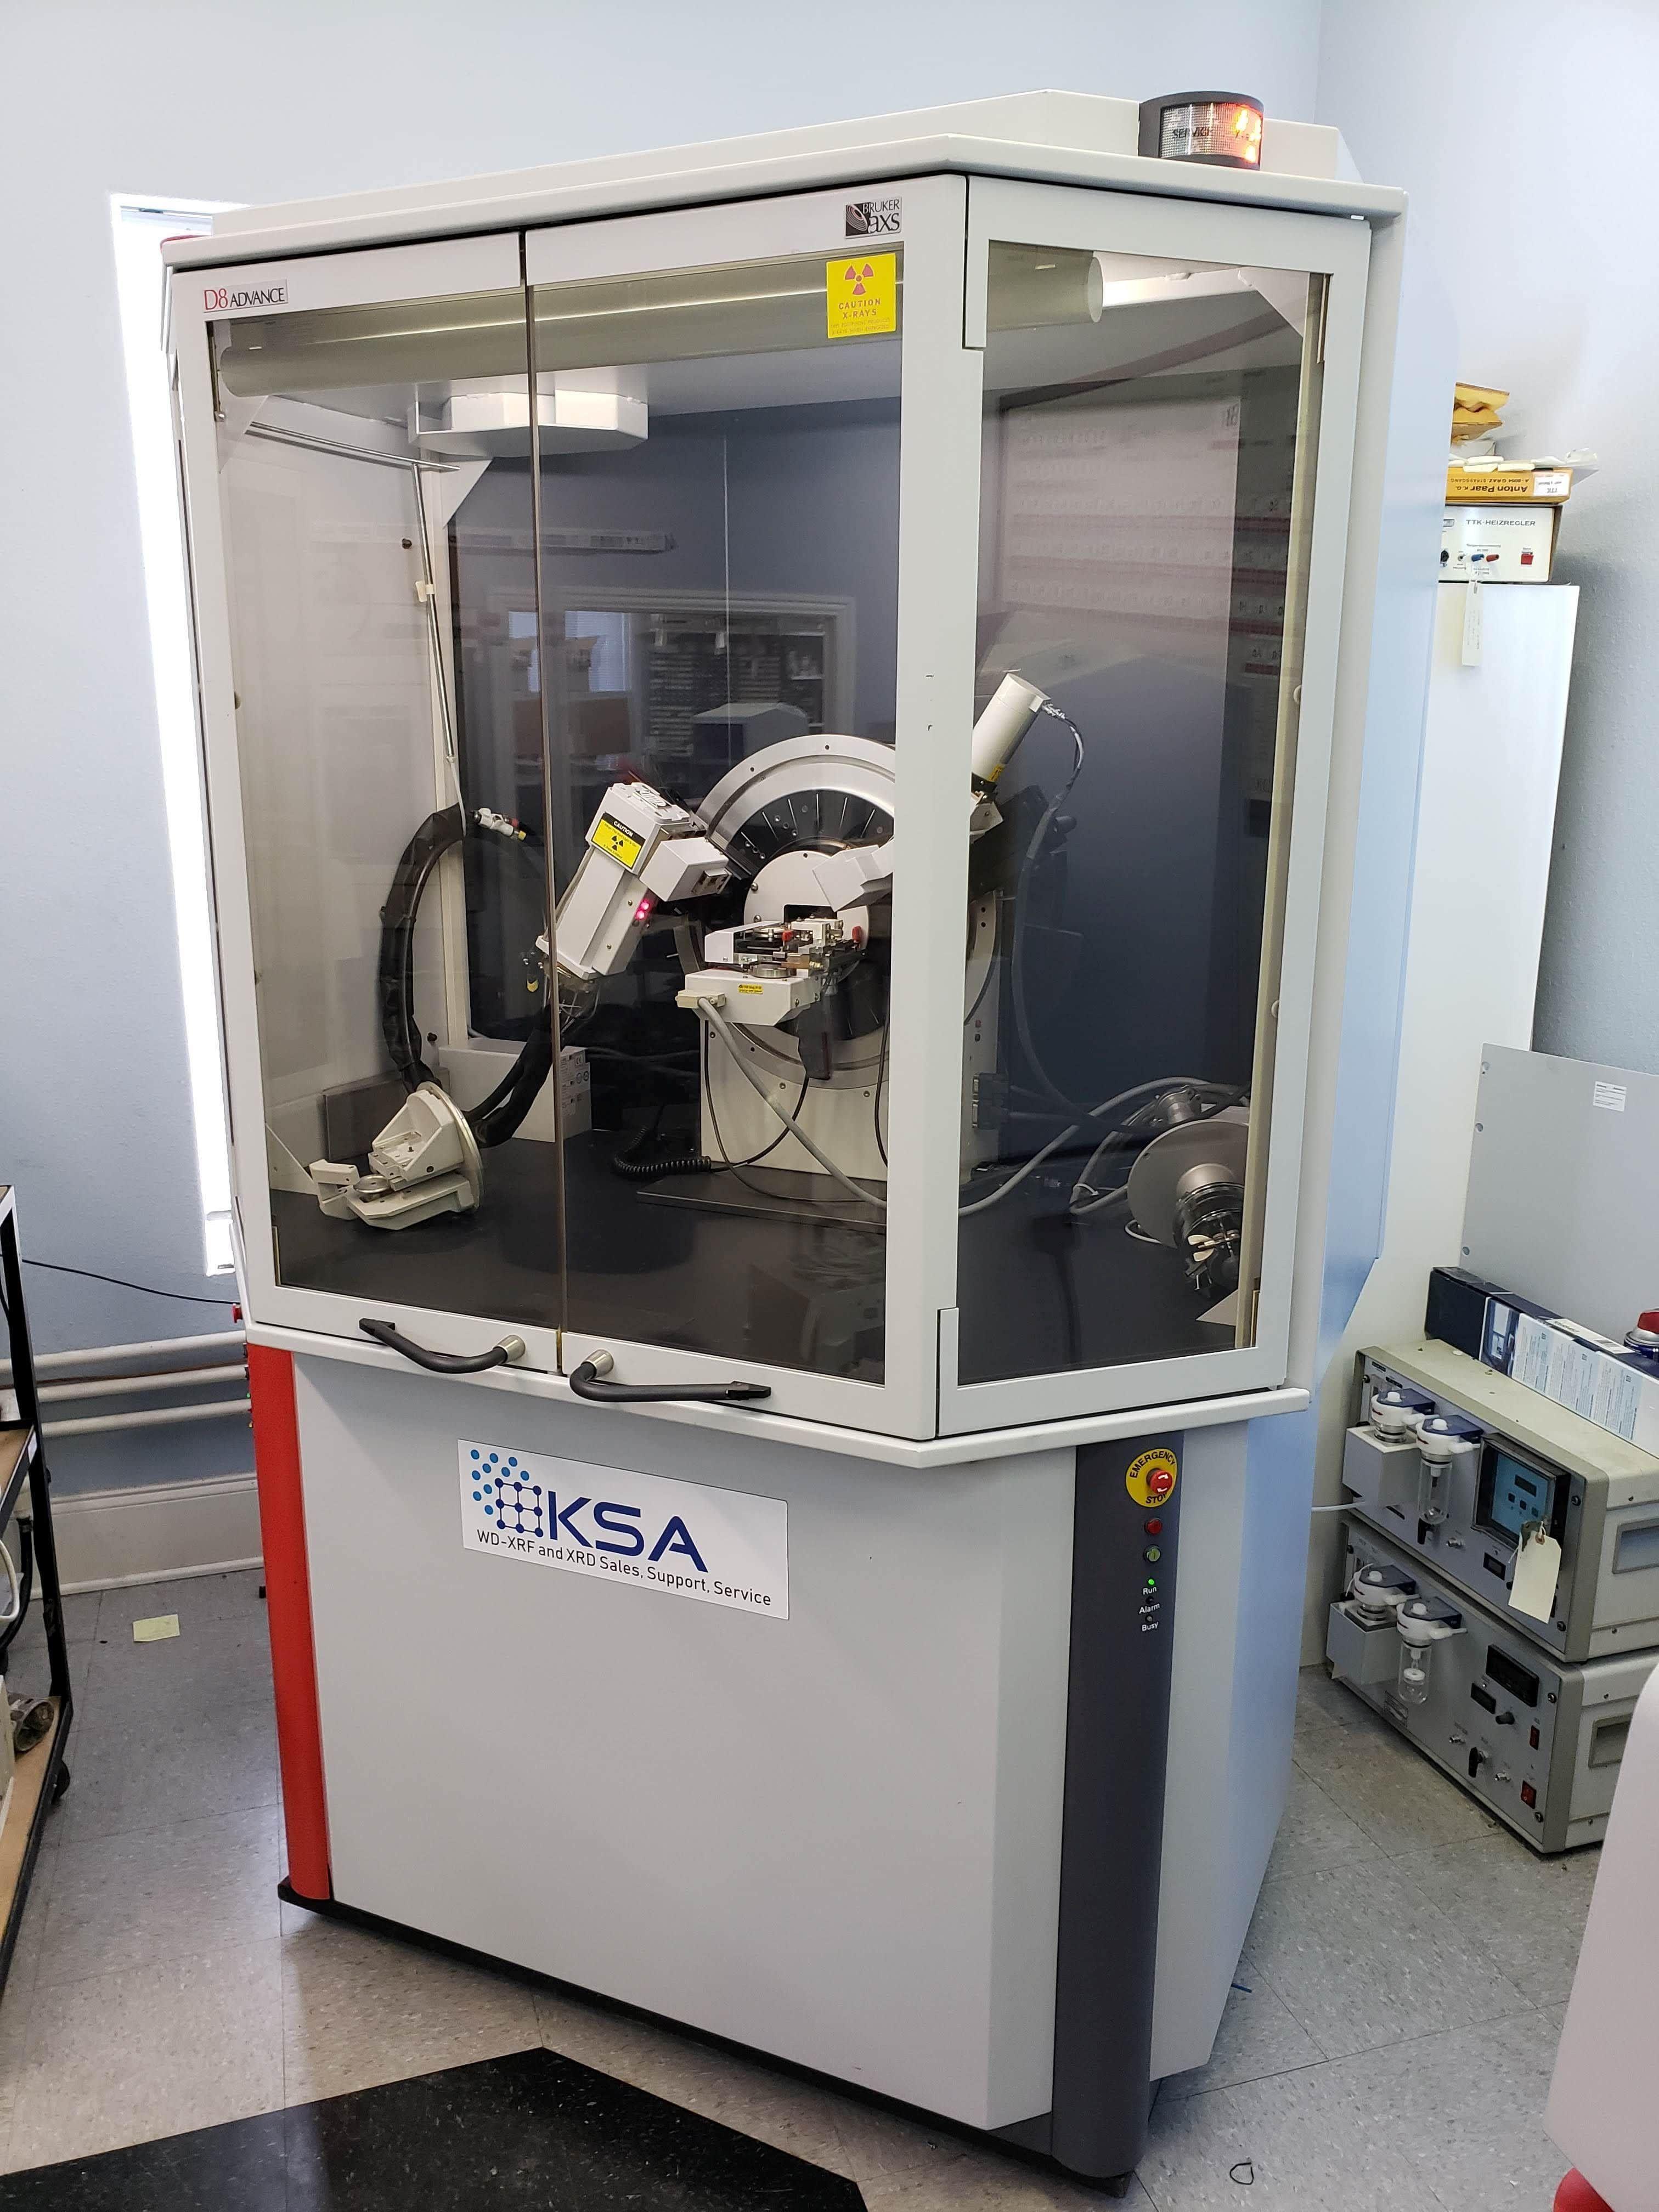 Bruker D8 Advance powder X-ray diffraction (XRD) system